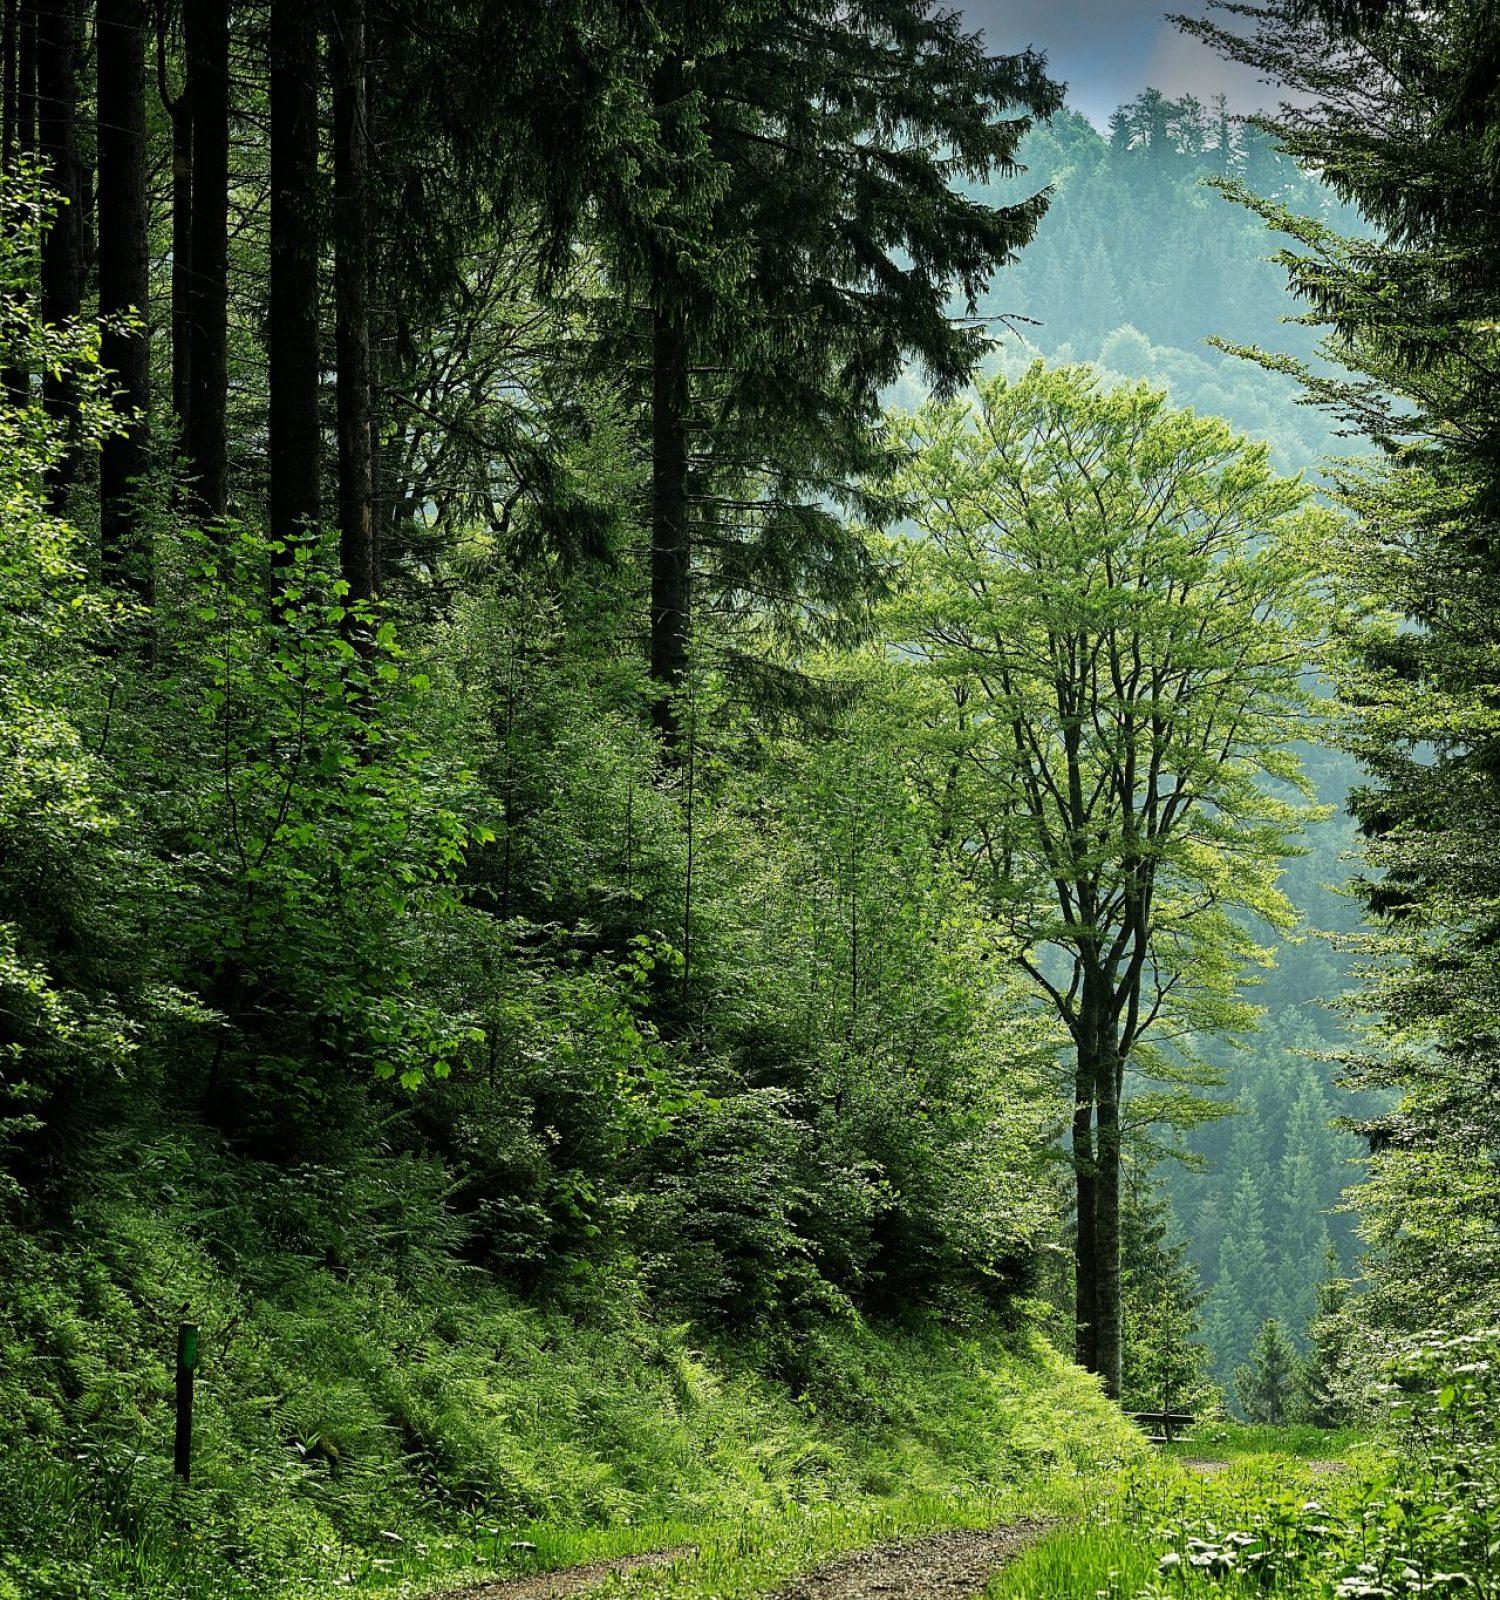 countryside-daylight-environment-109391